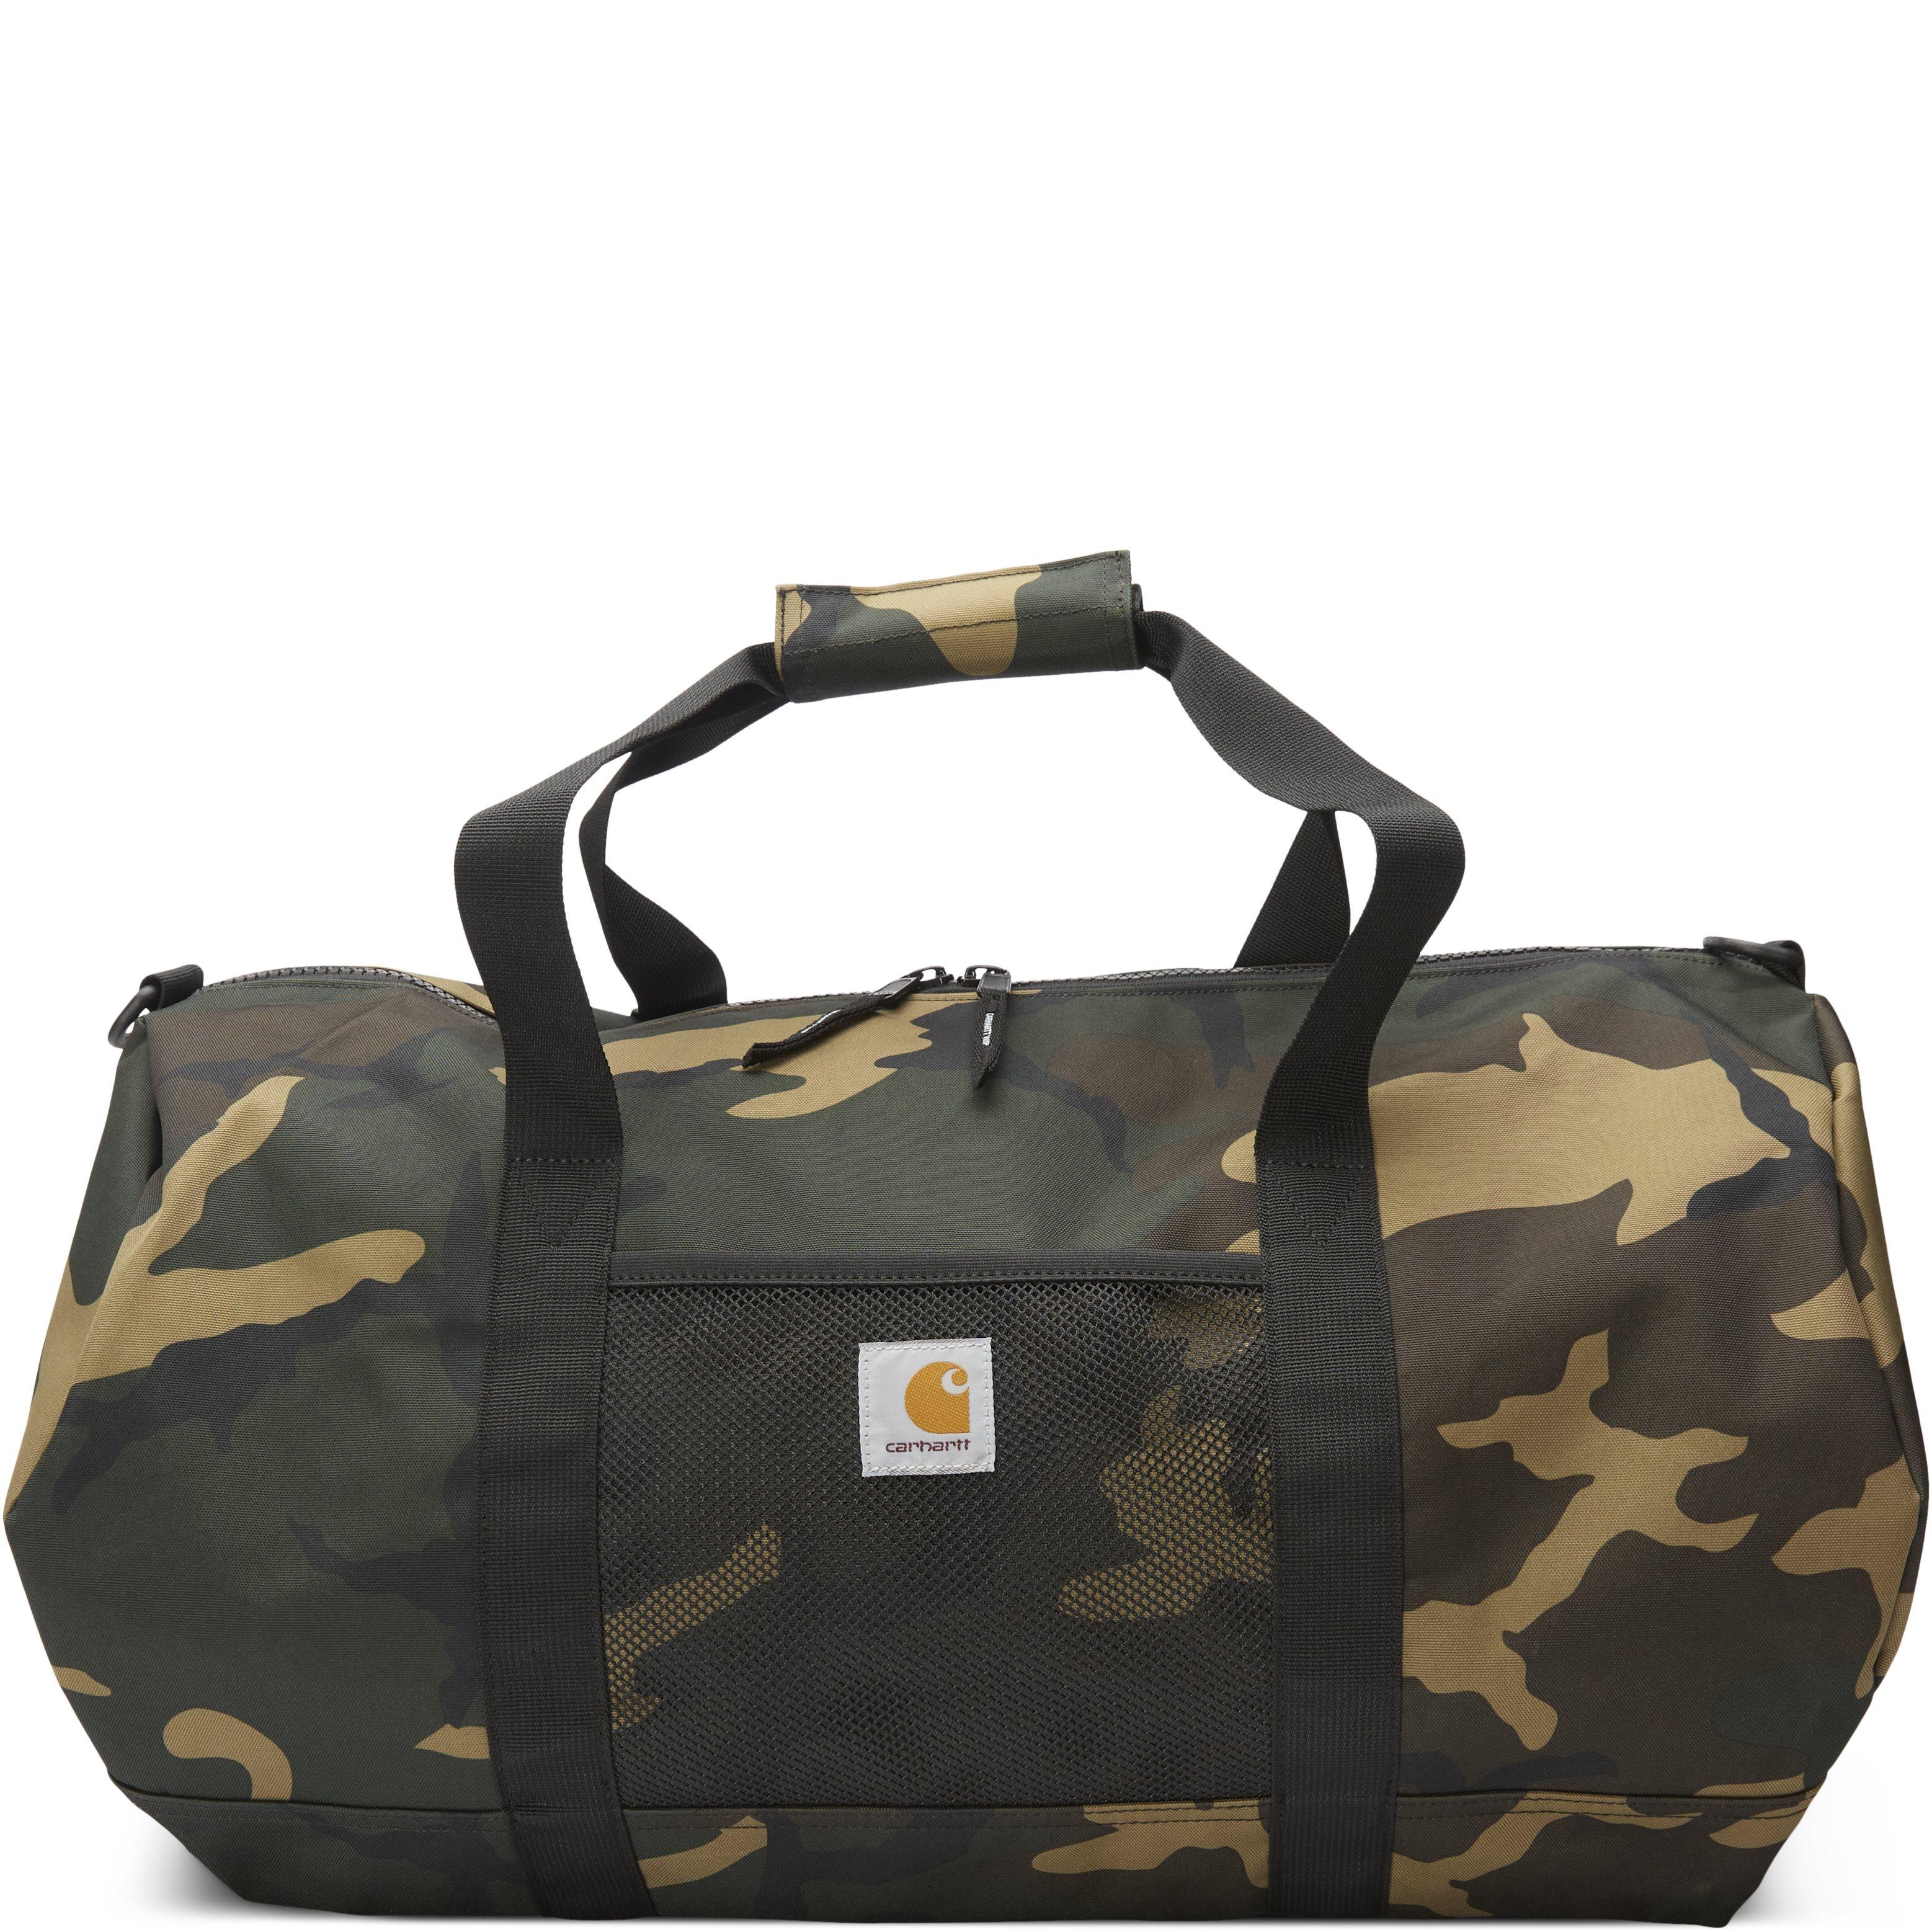 Wright Duffle Bag - Tasker - Army